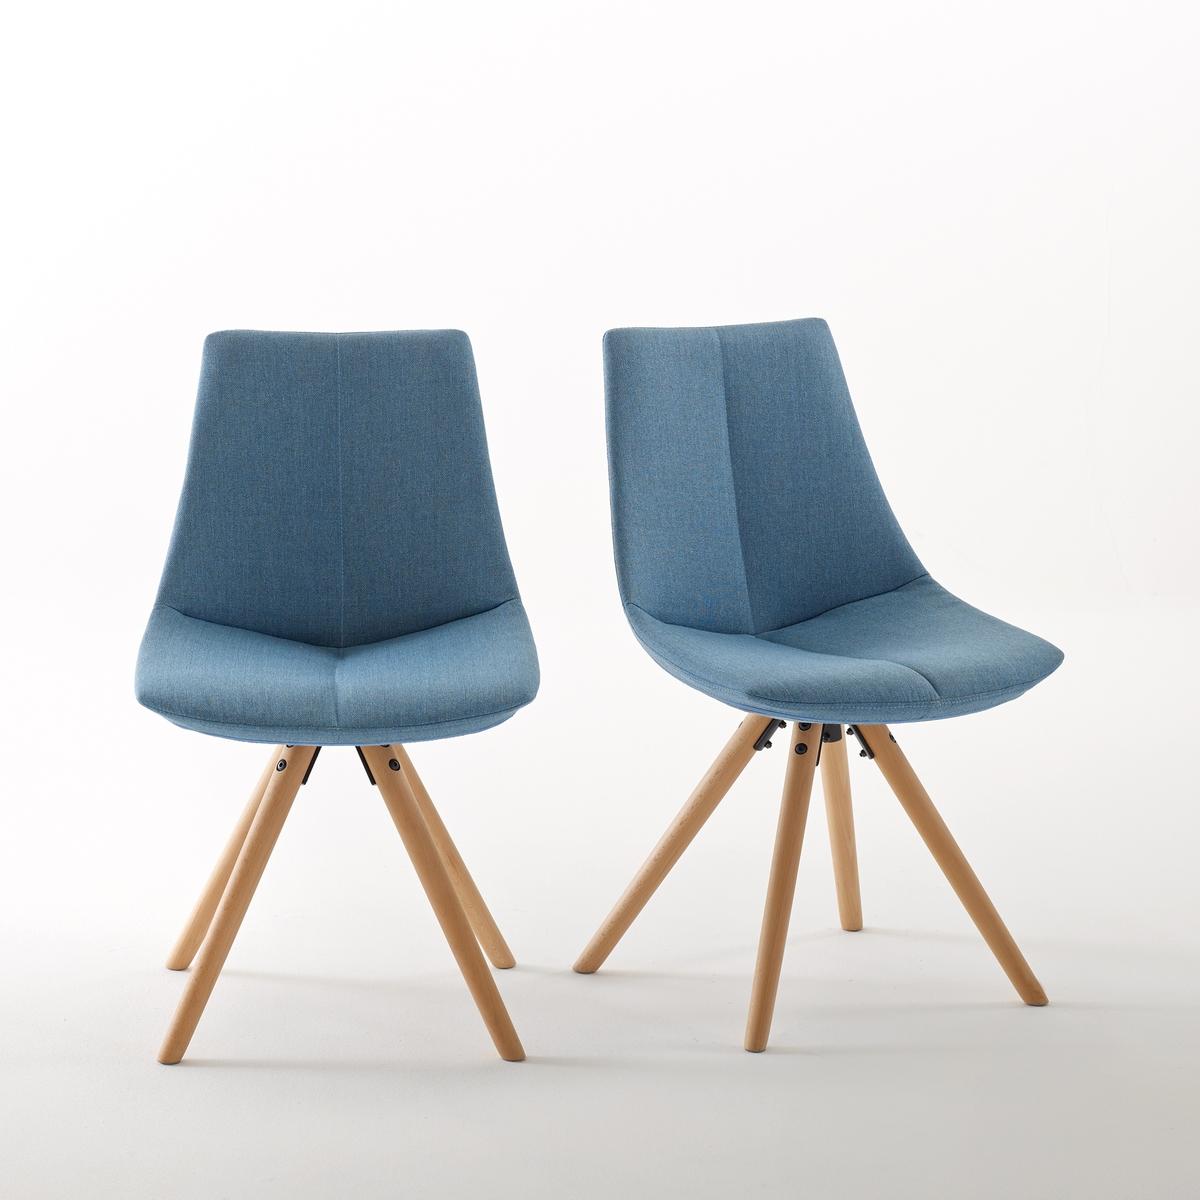 2 стула мягких ASTING